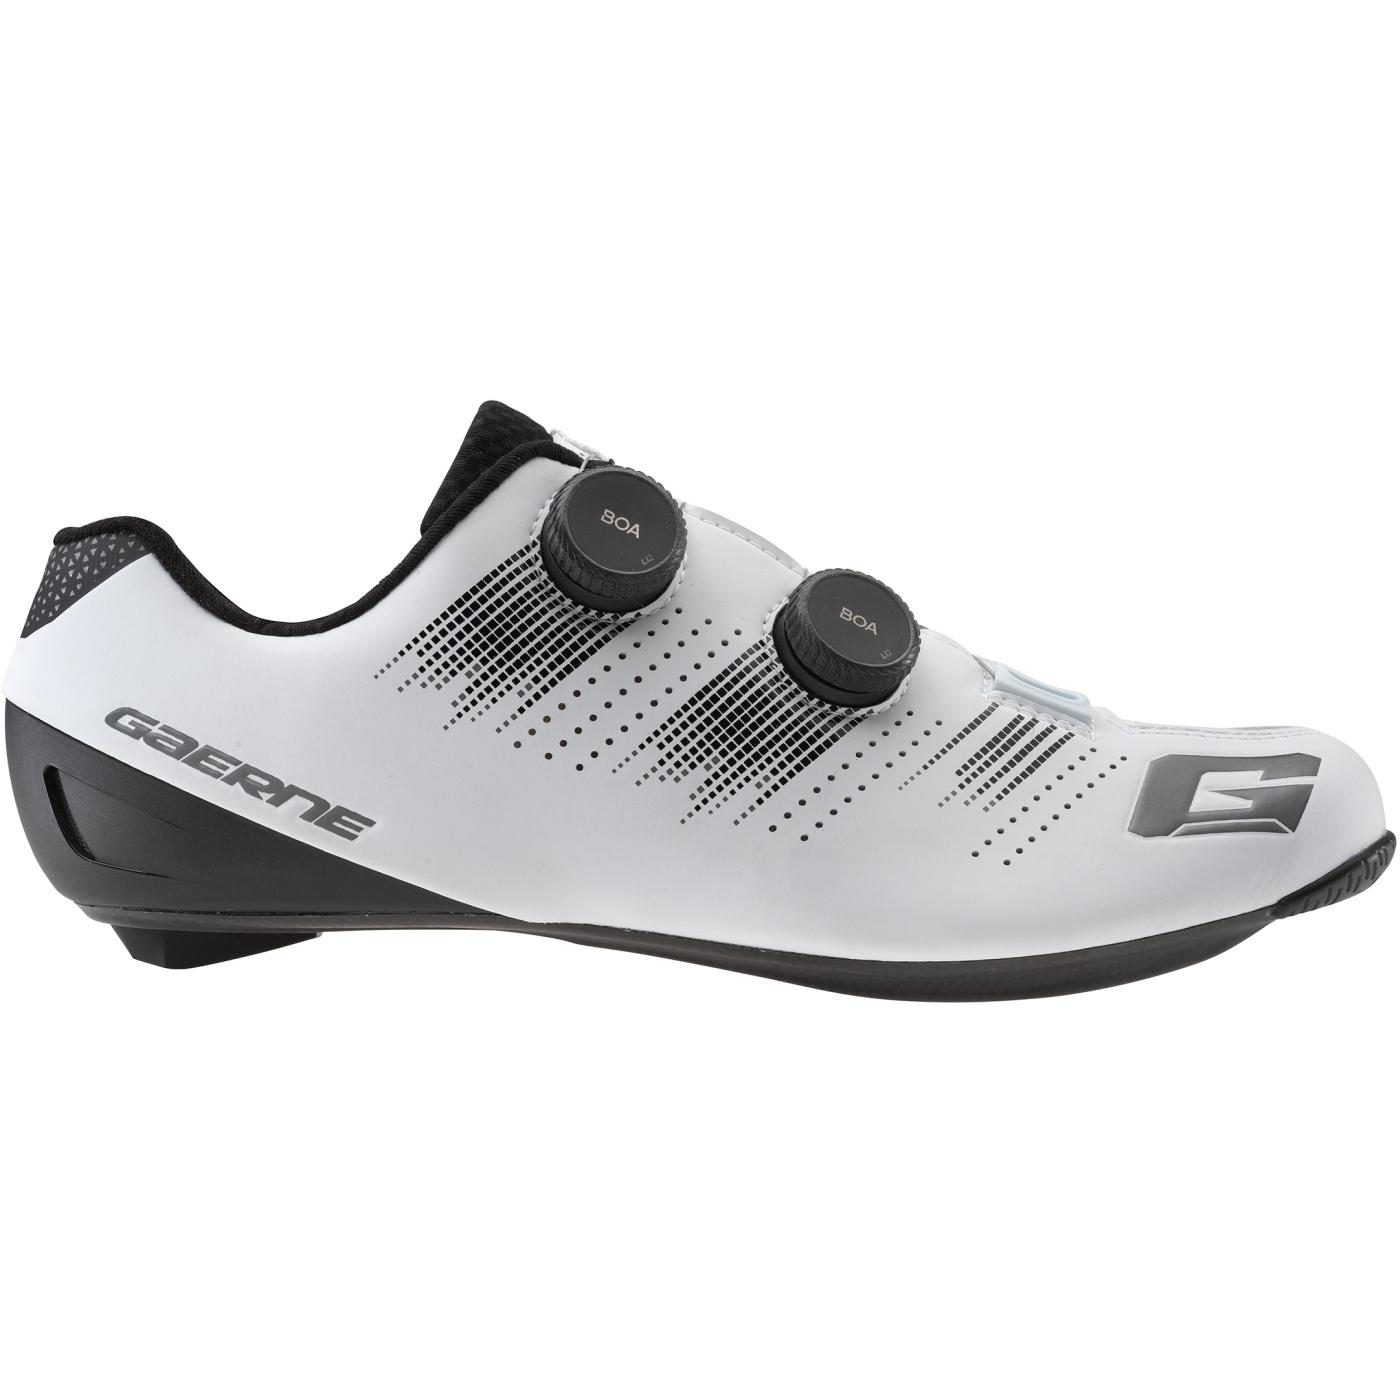 Picture of Gaerne Carbon G.Chrono Road Shoe - Matt White